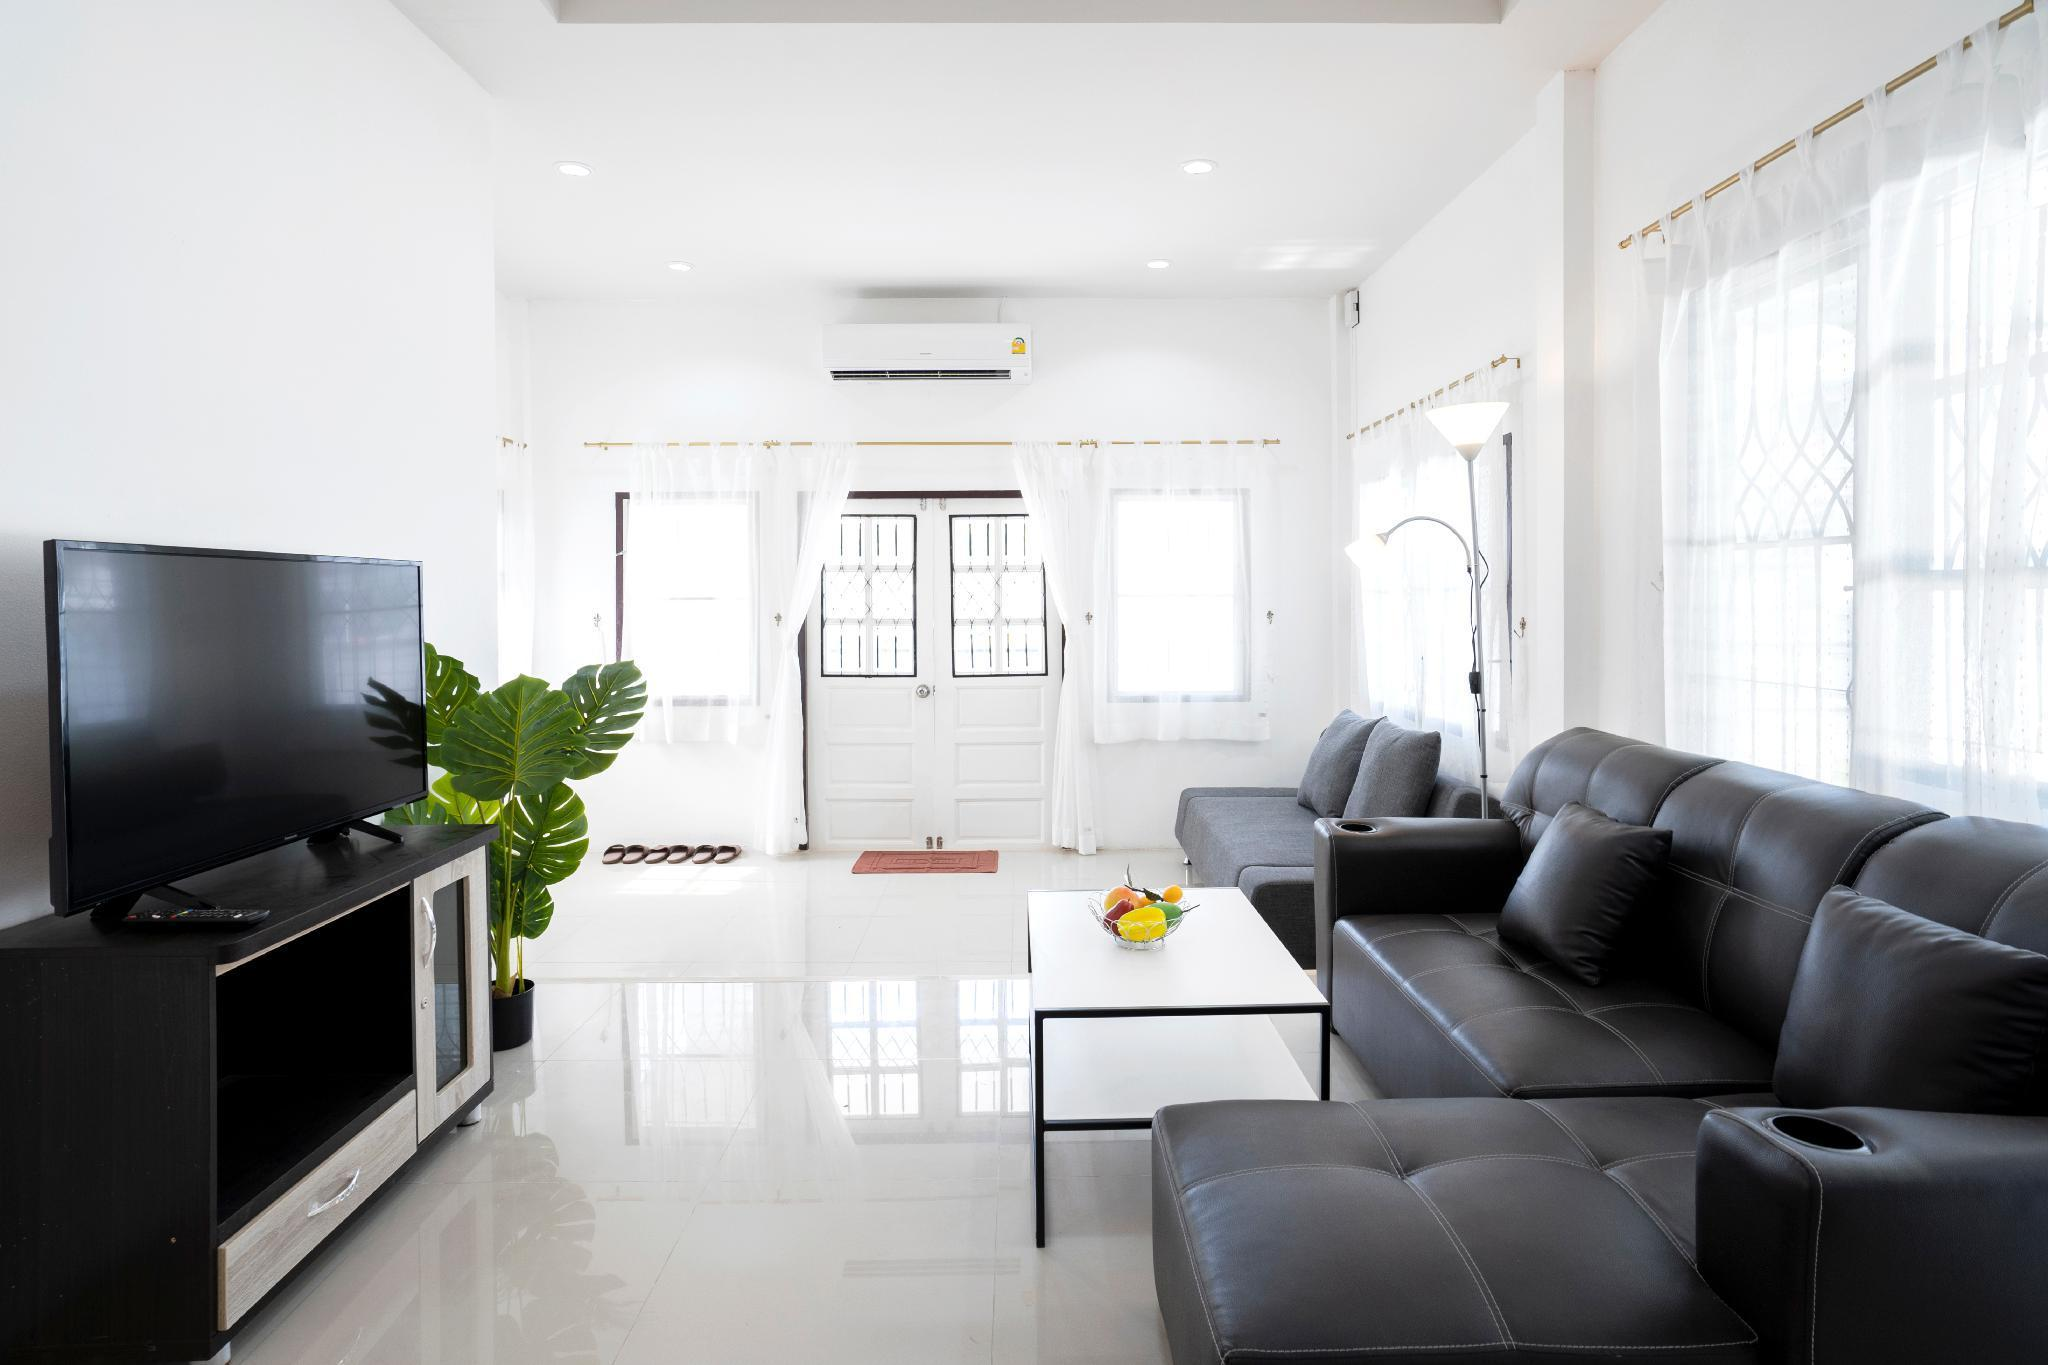 3BR cozy house,near Train Station บ้านเดี่ยว 3 ห้องนอน 2 ห้องน้ำส่วนตัว ขนาด 120 ตร.ม. – เจริญเมือง